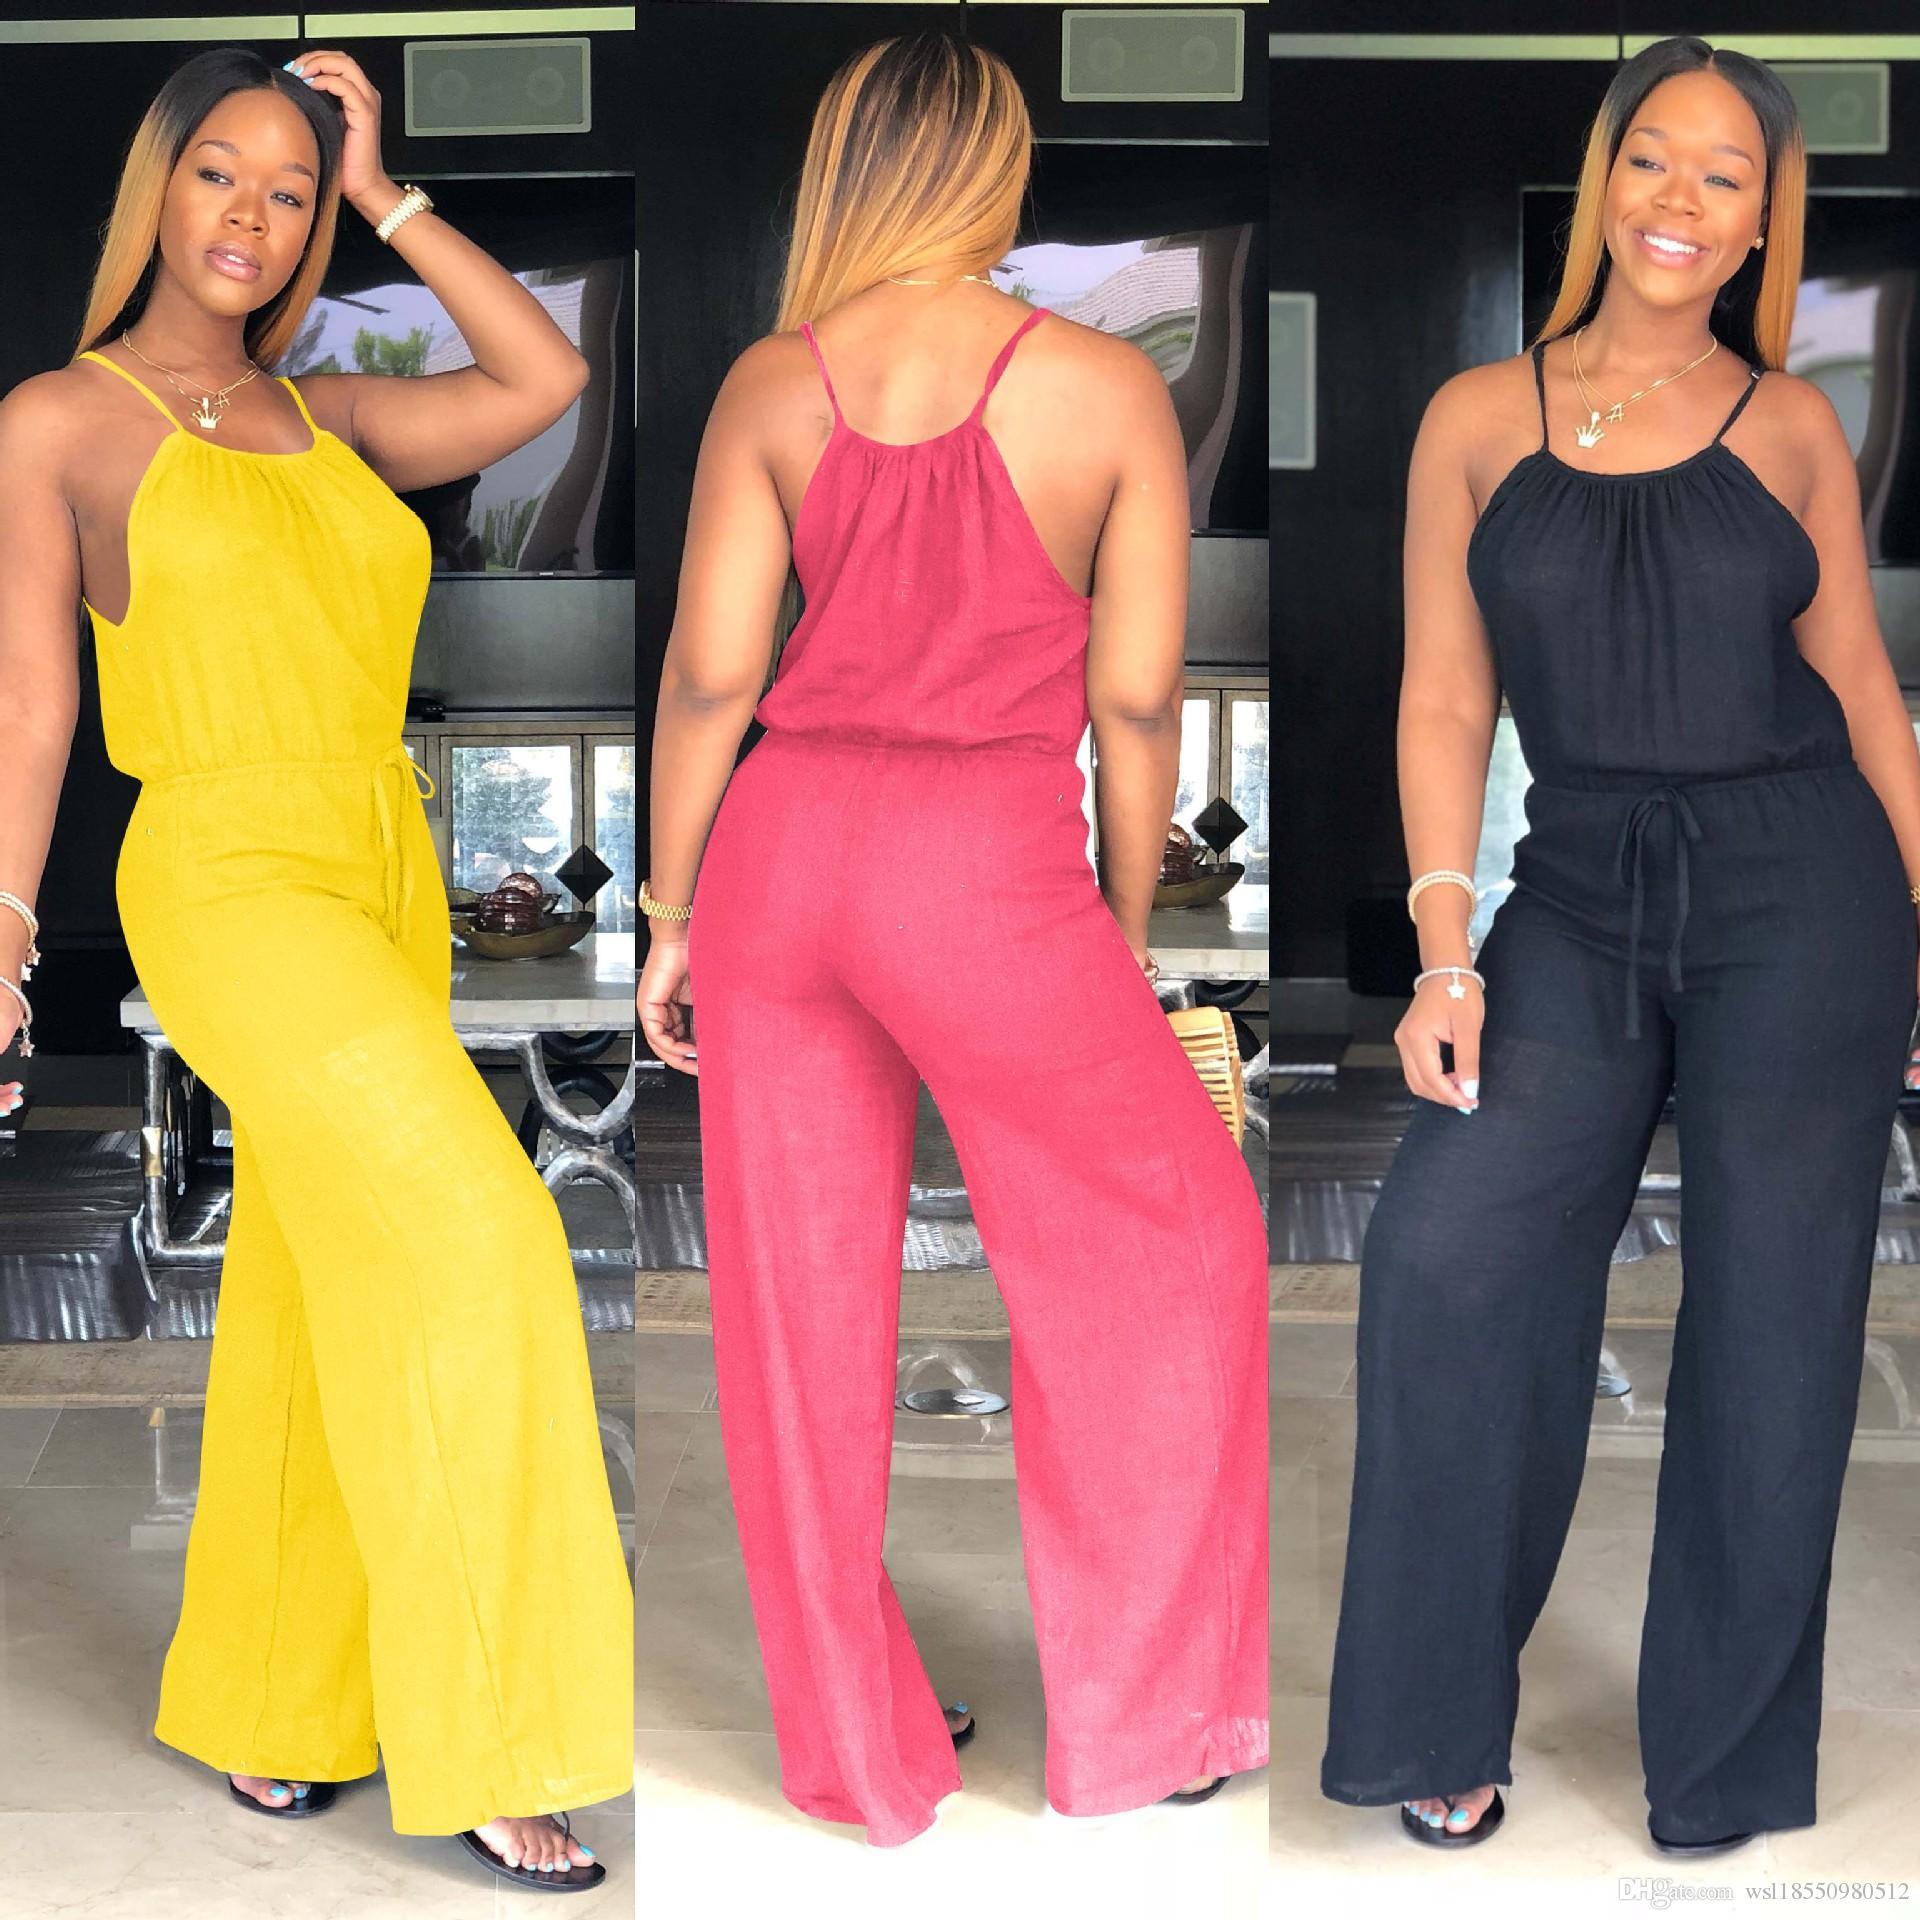 5bac5843fc5 2019 Women S Black Smart Letter Print Jumpsuit Spring Summer 2019 Off  Shoulder Rompers Long Pants Jumpsuit Bodysuit Plus Size From  Wsl18550980512